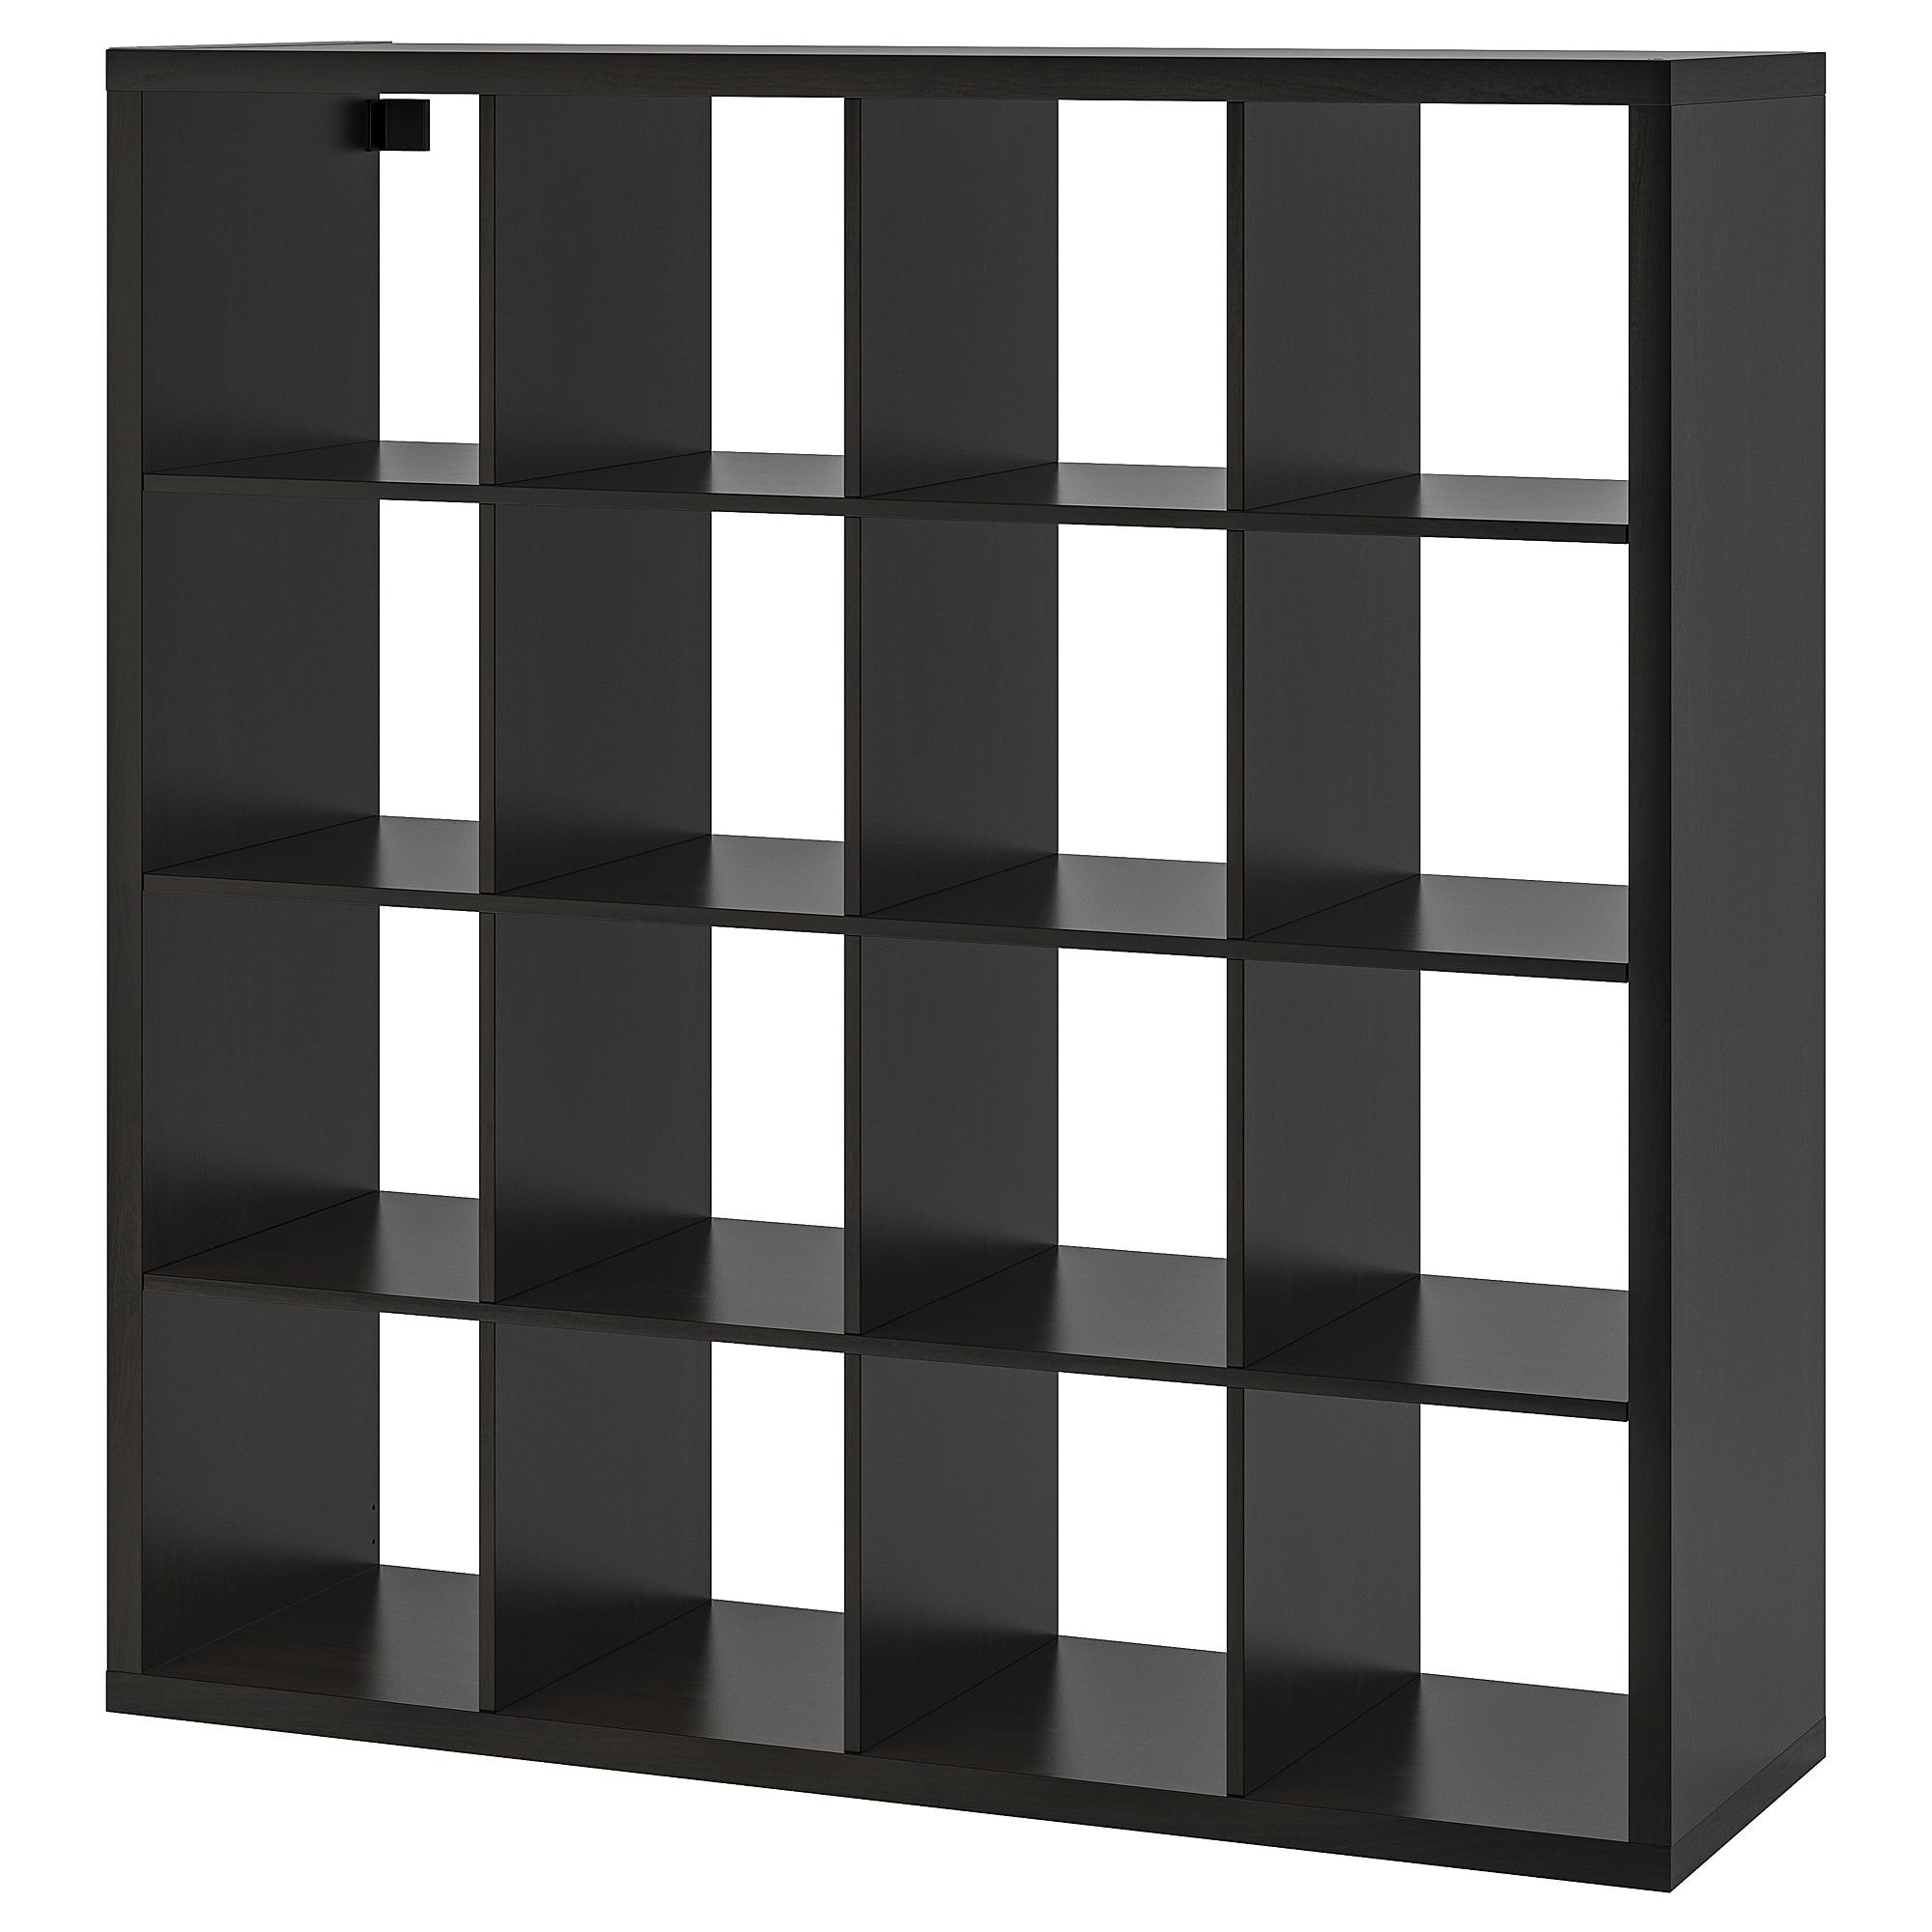 Ikea Kallax Black Brown Shelf Unit Home Decor In 2019